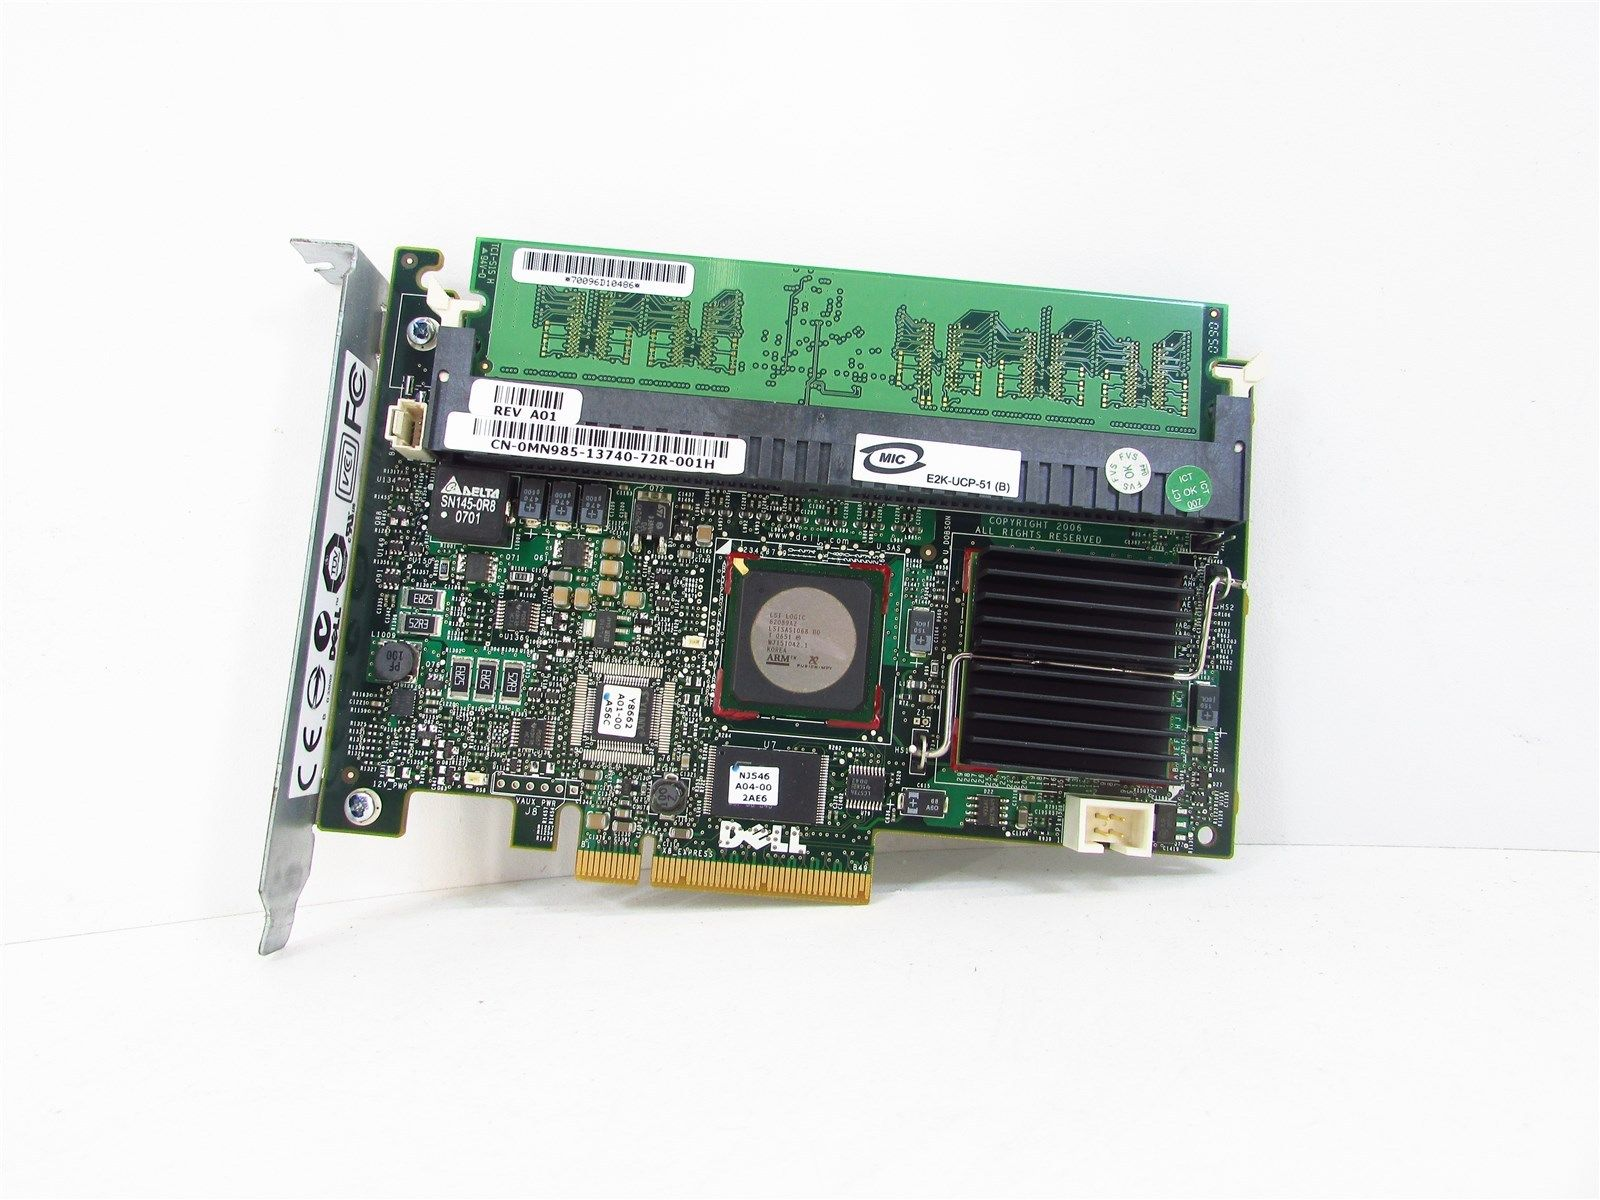 Dell Perc 5I PCI-E SAS/SATA Raid Controller (MN985)